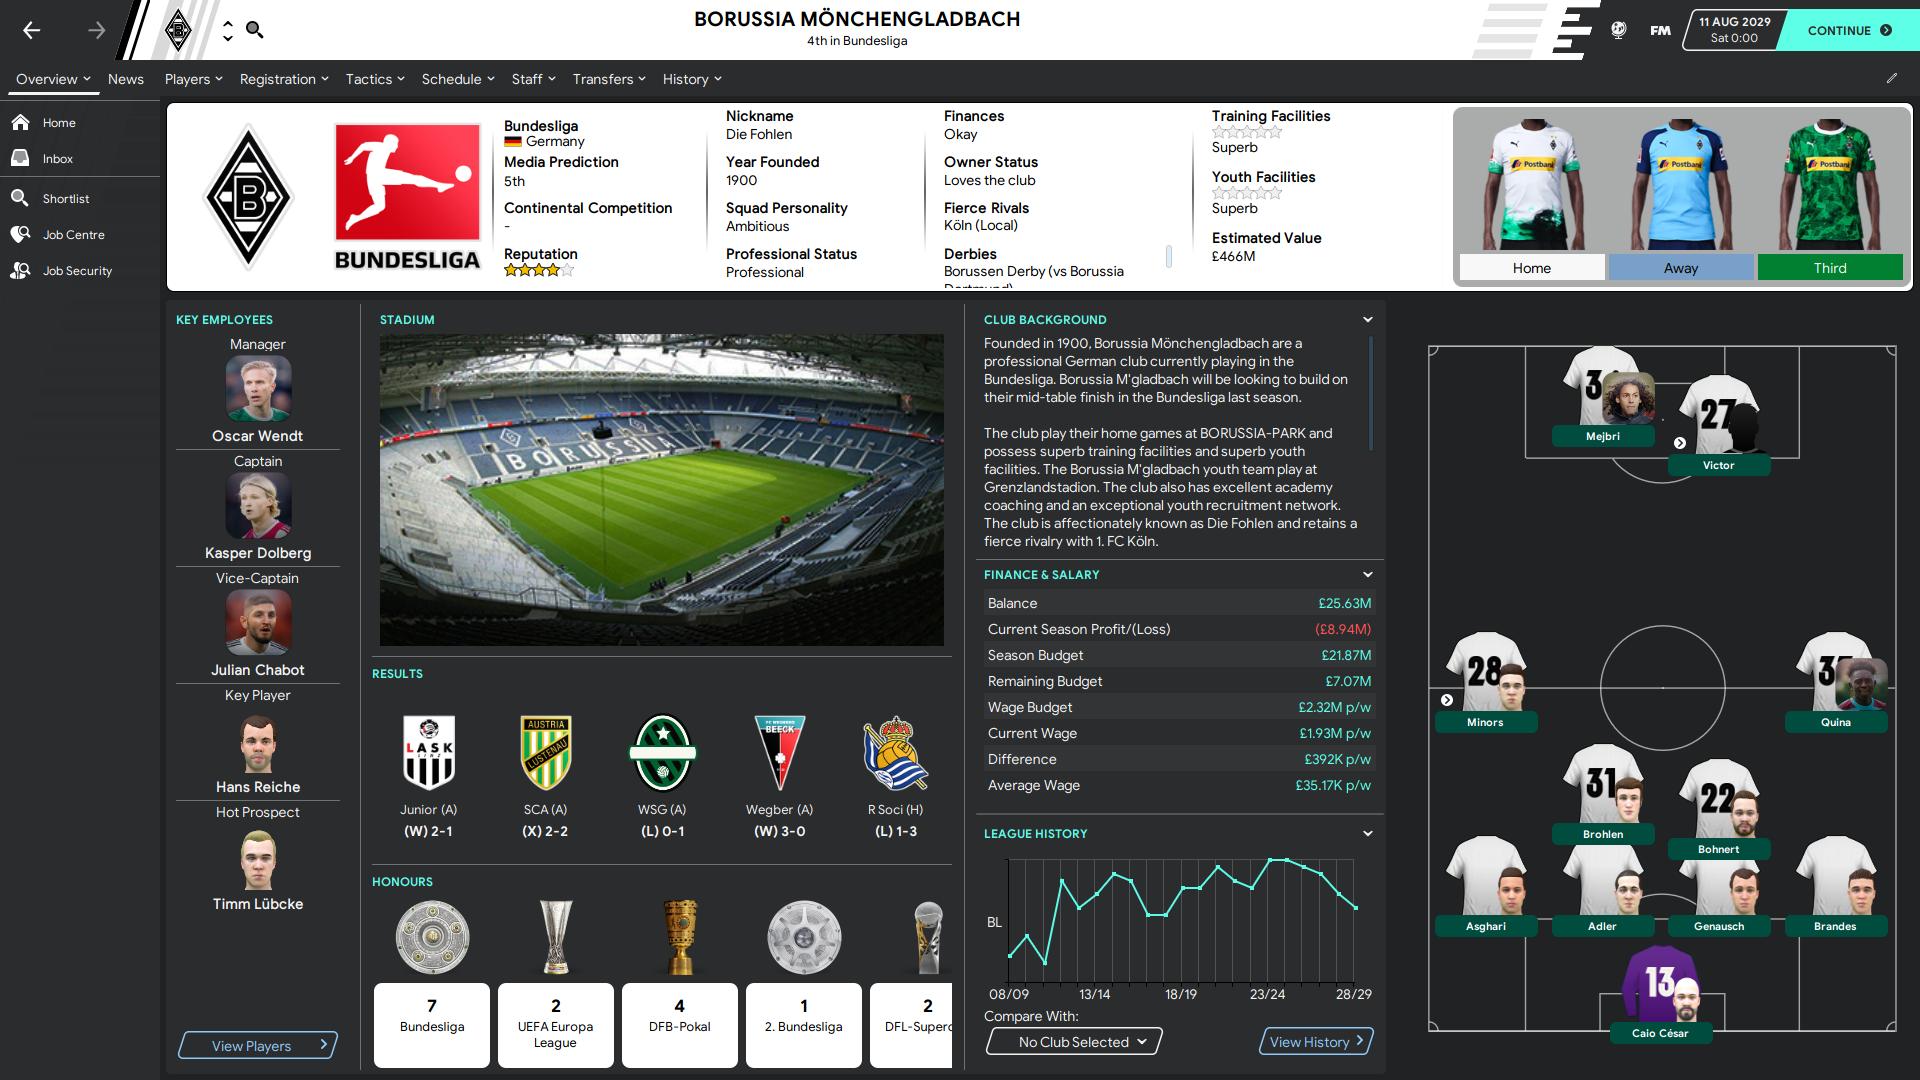 Borussia Mönchengladbach_ Profile.png